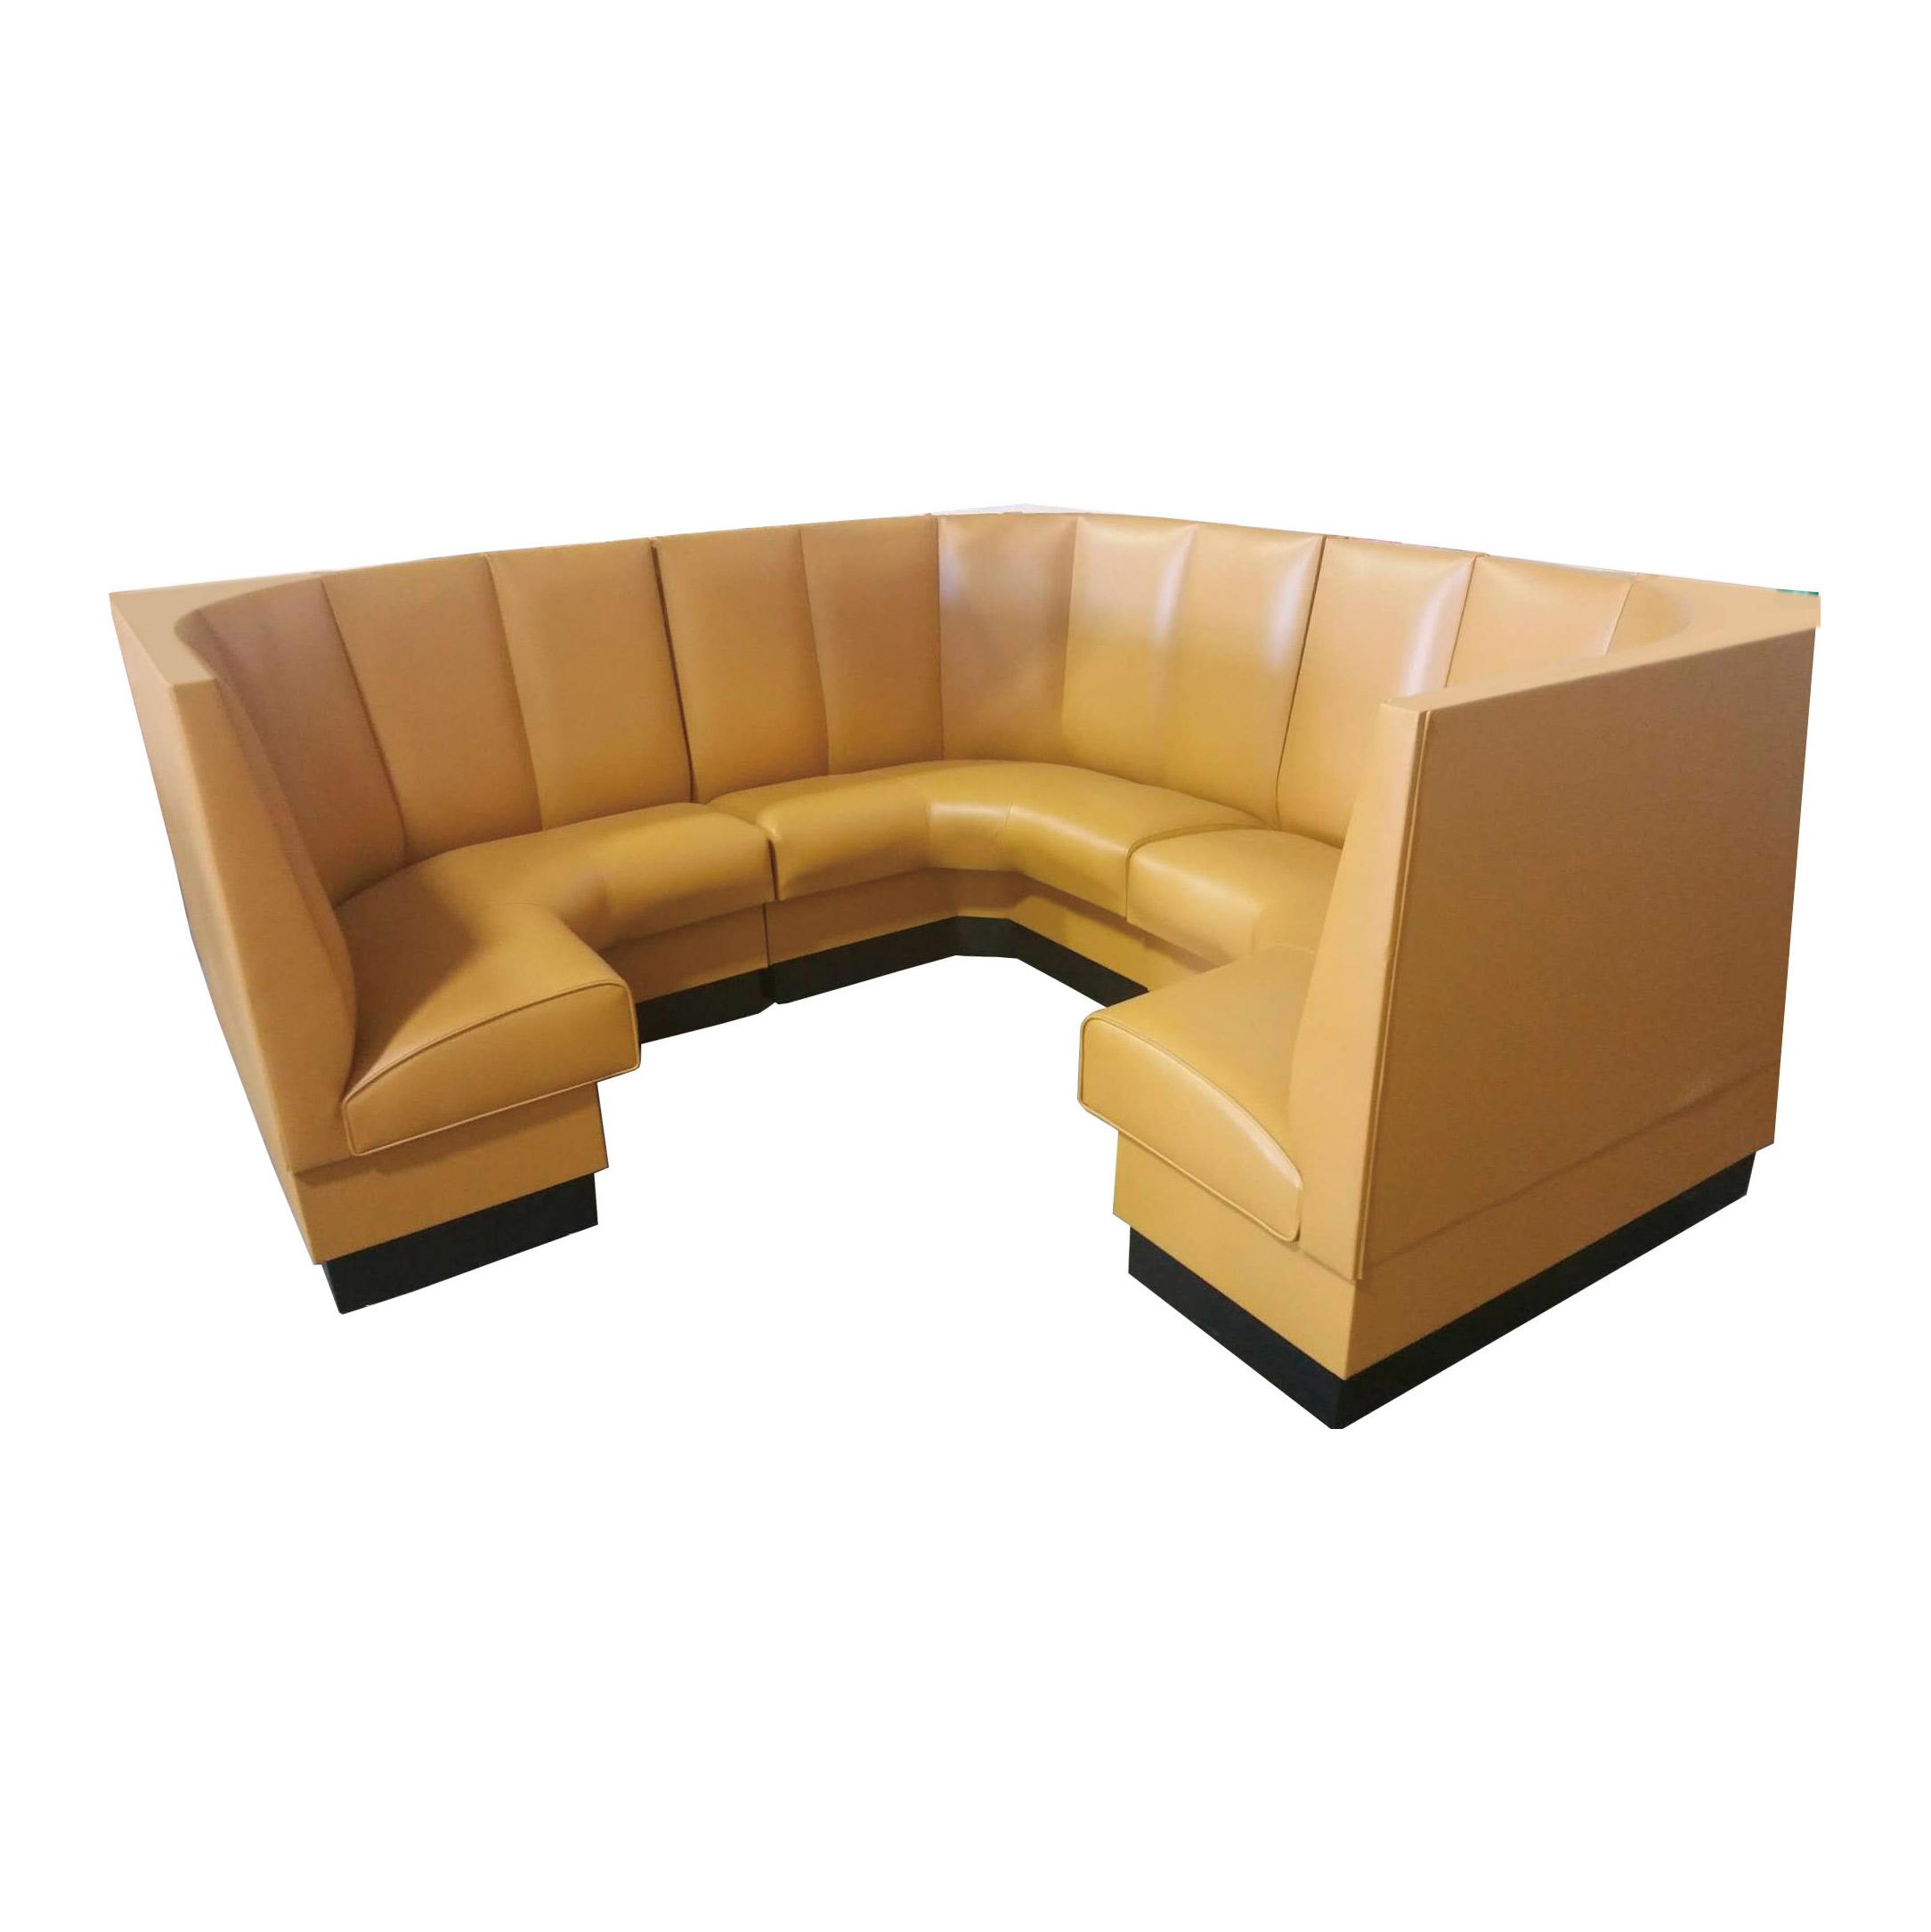 MKLD Furniture 36-V3CB-1/2C booth